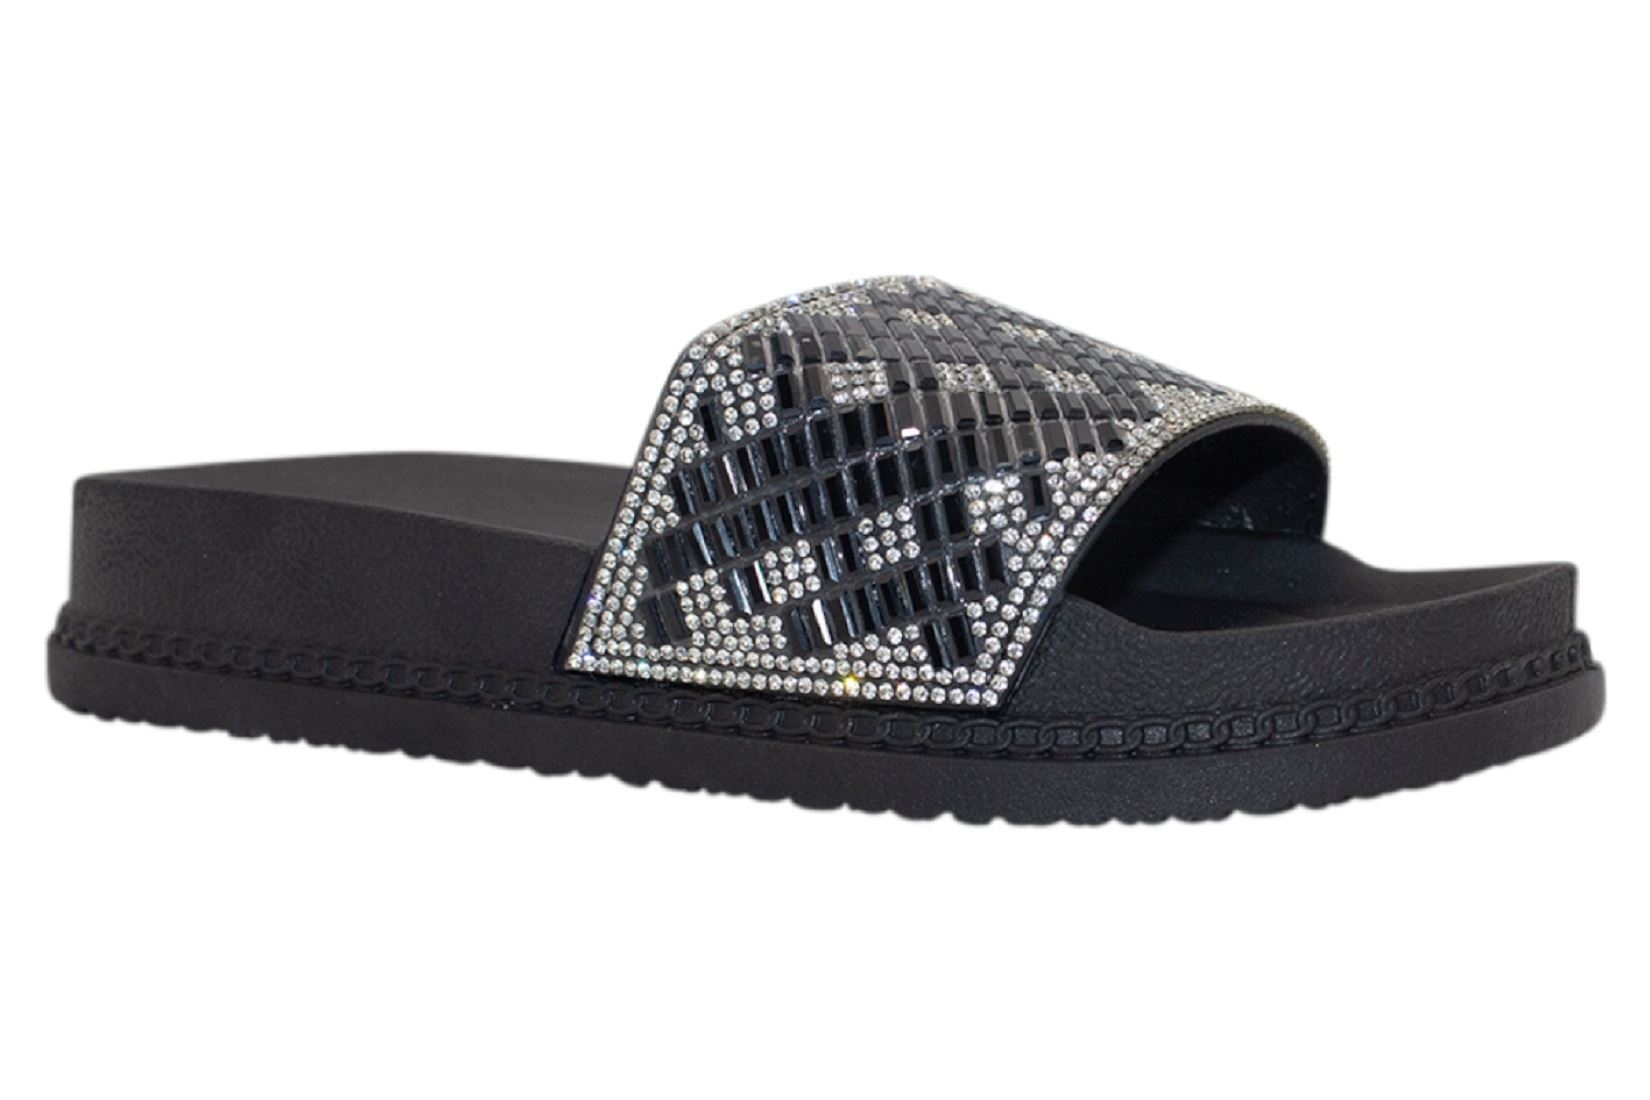 Womens-Sliders-Casual-Slippers-Mules-Ladies-Diamante-Flip-Flop-Sandals-Shoes thumbnail 74